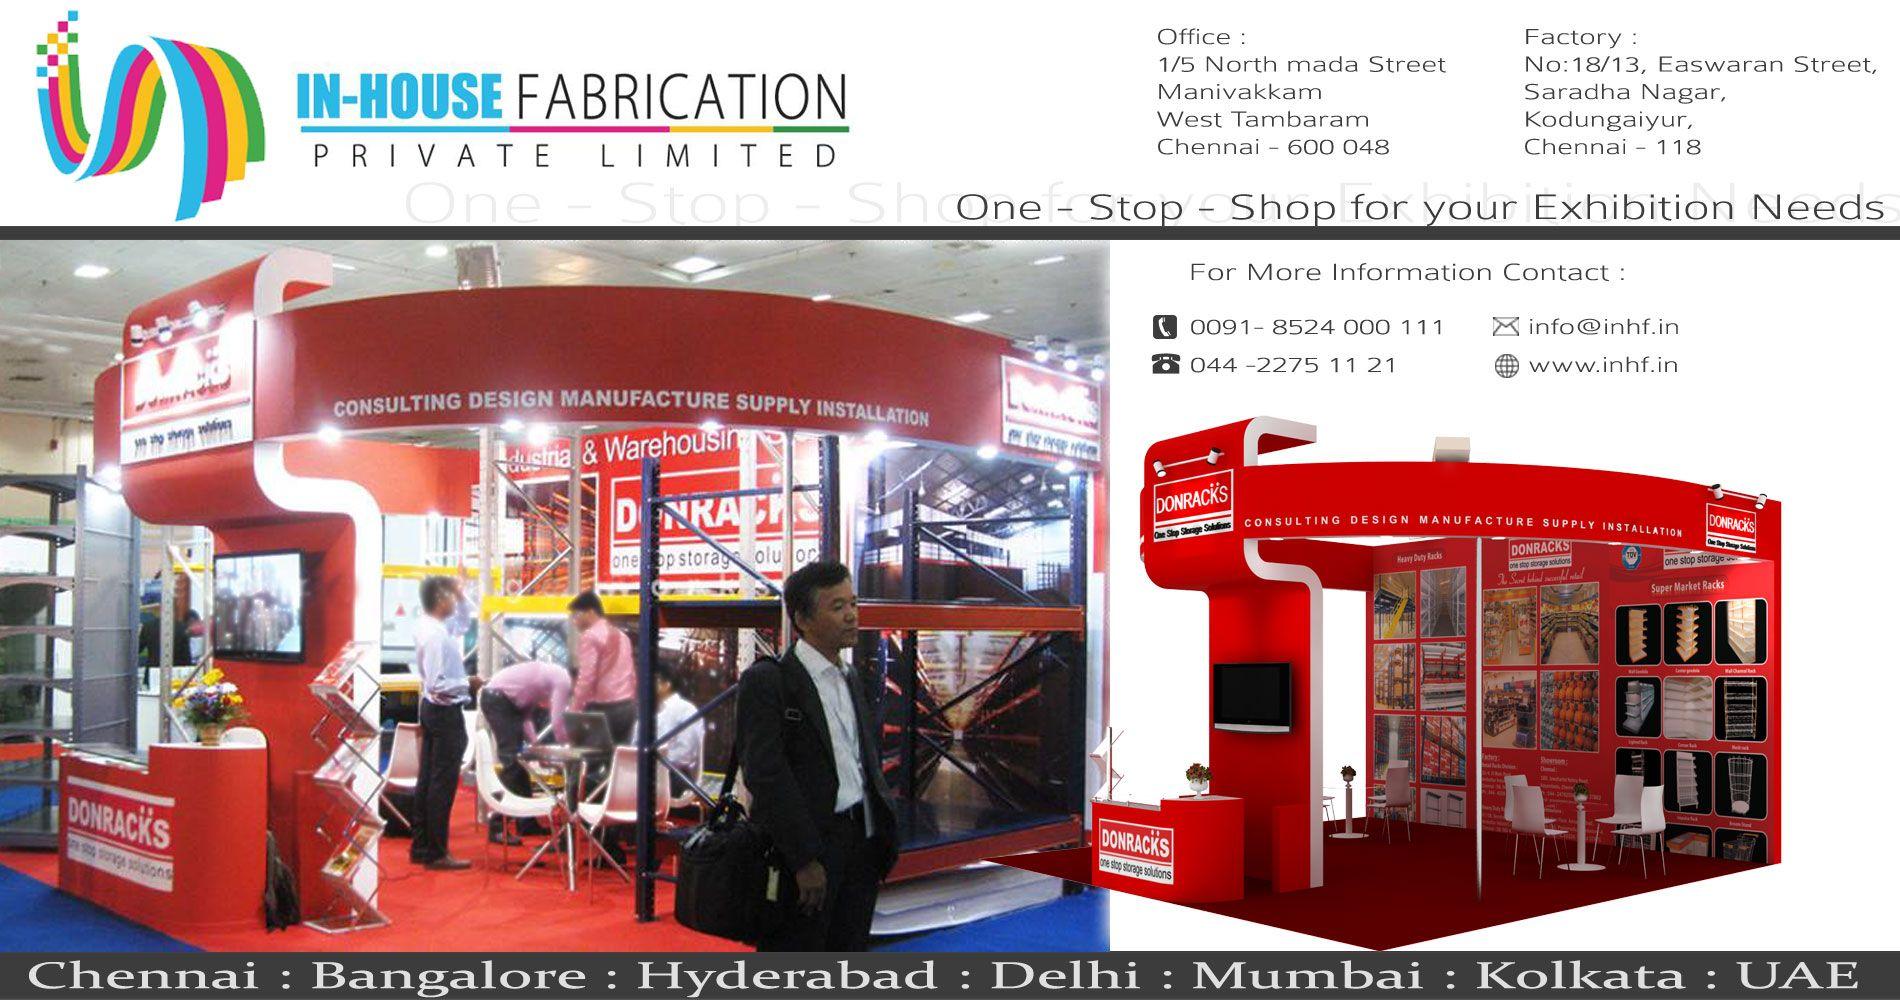 Exhibition Stall Fabricators In Chennai : Interior designing company in chennai valo i